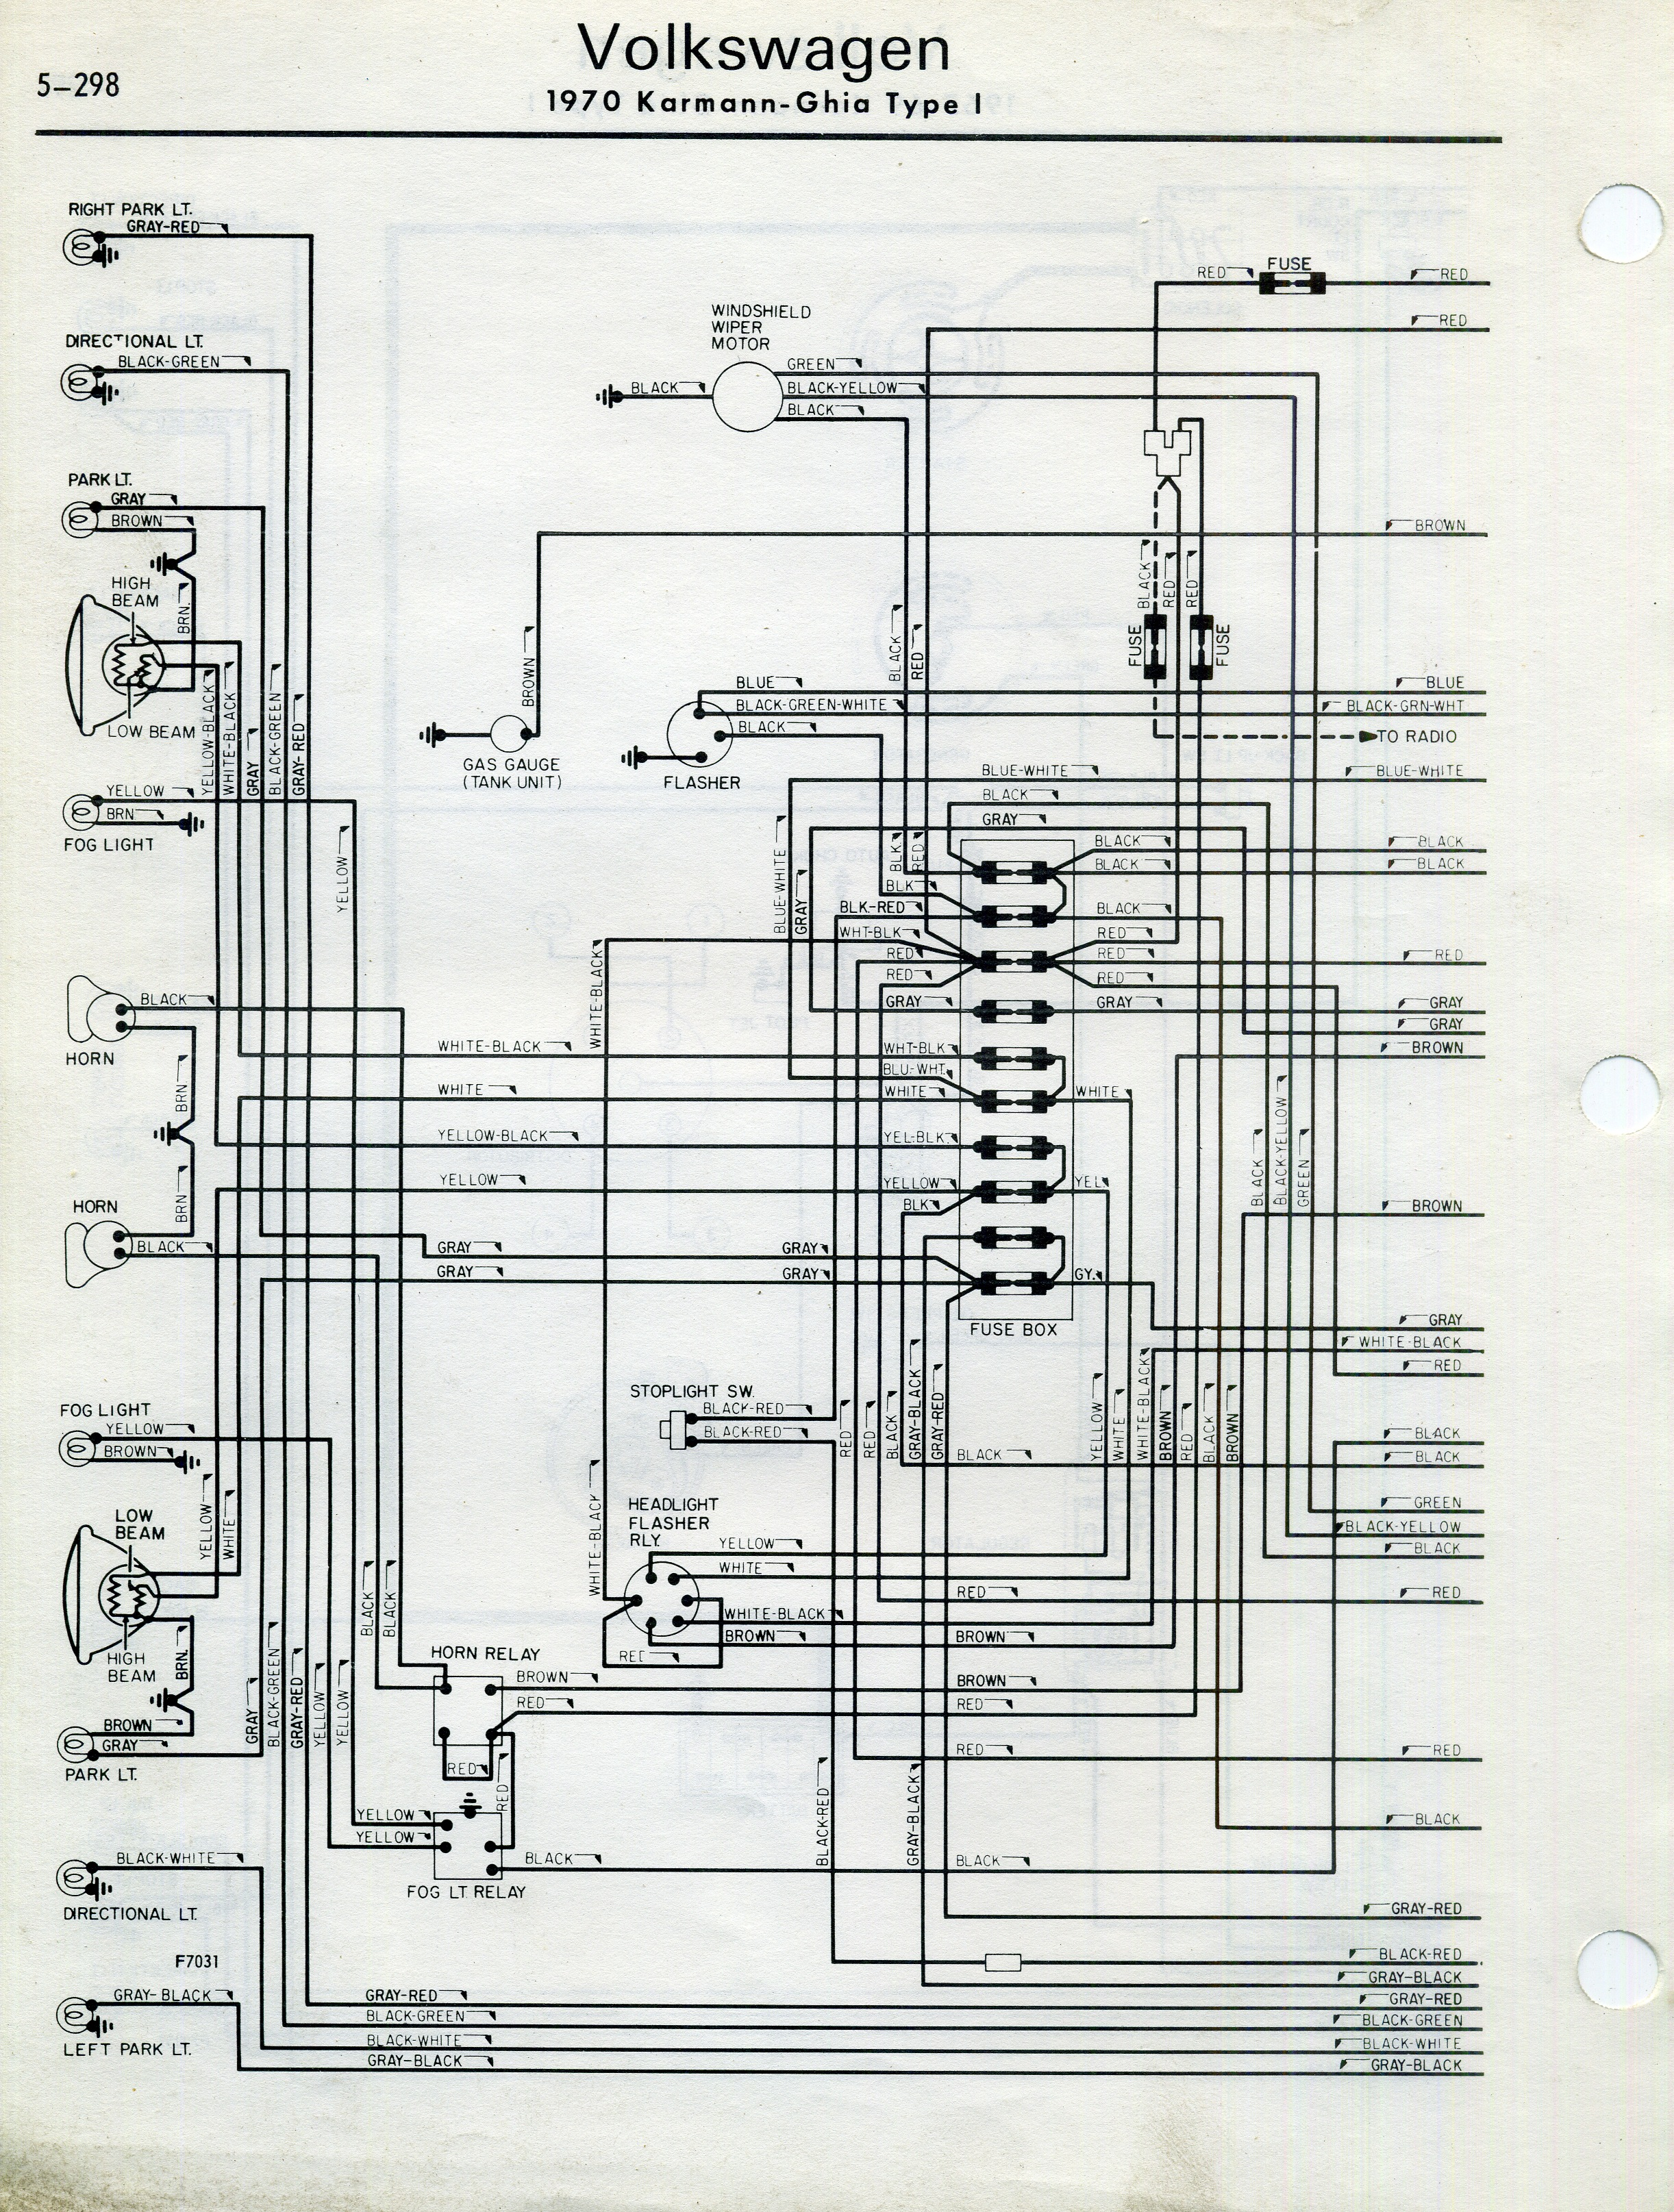 1973 volkswagen karmann ghia wiring diagram